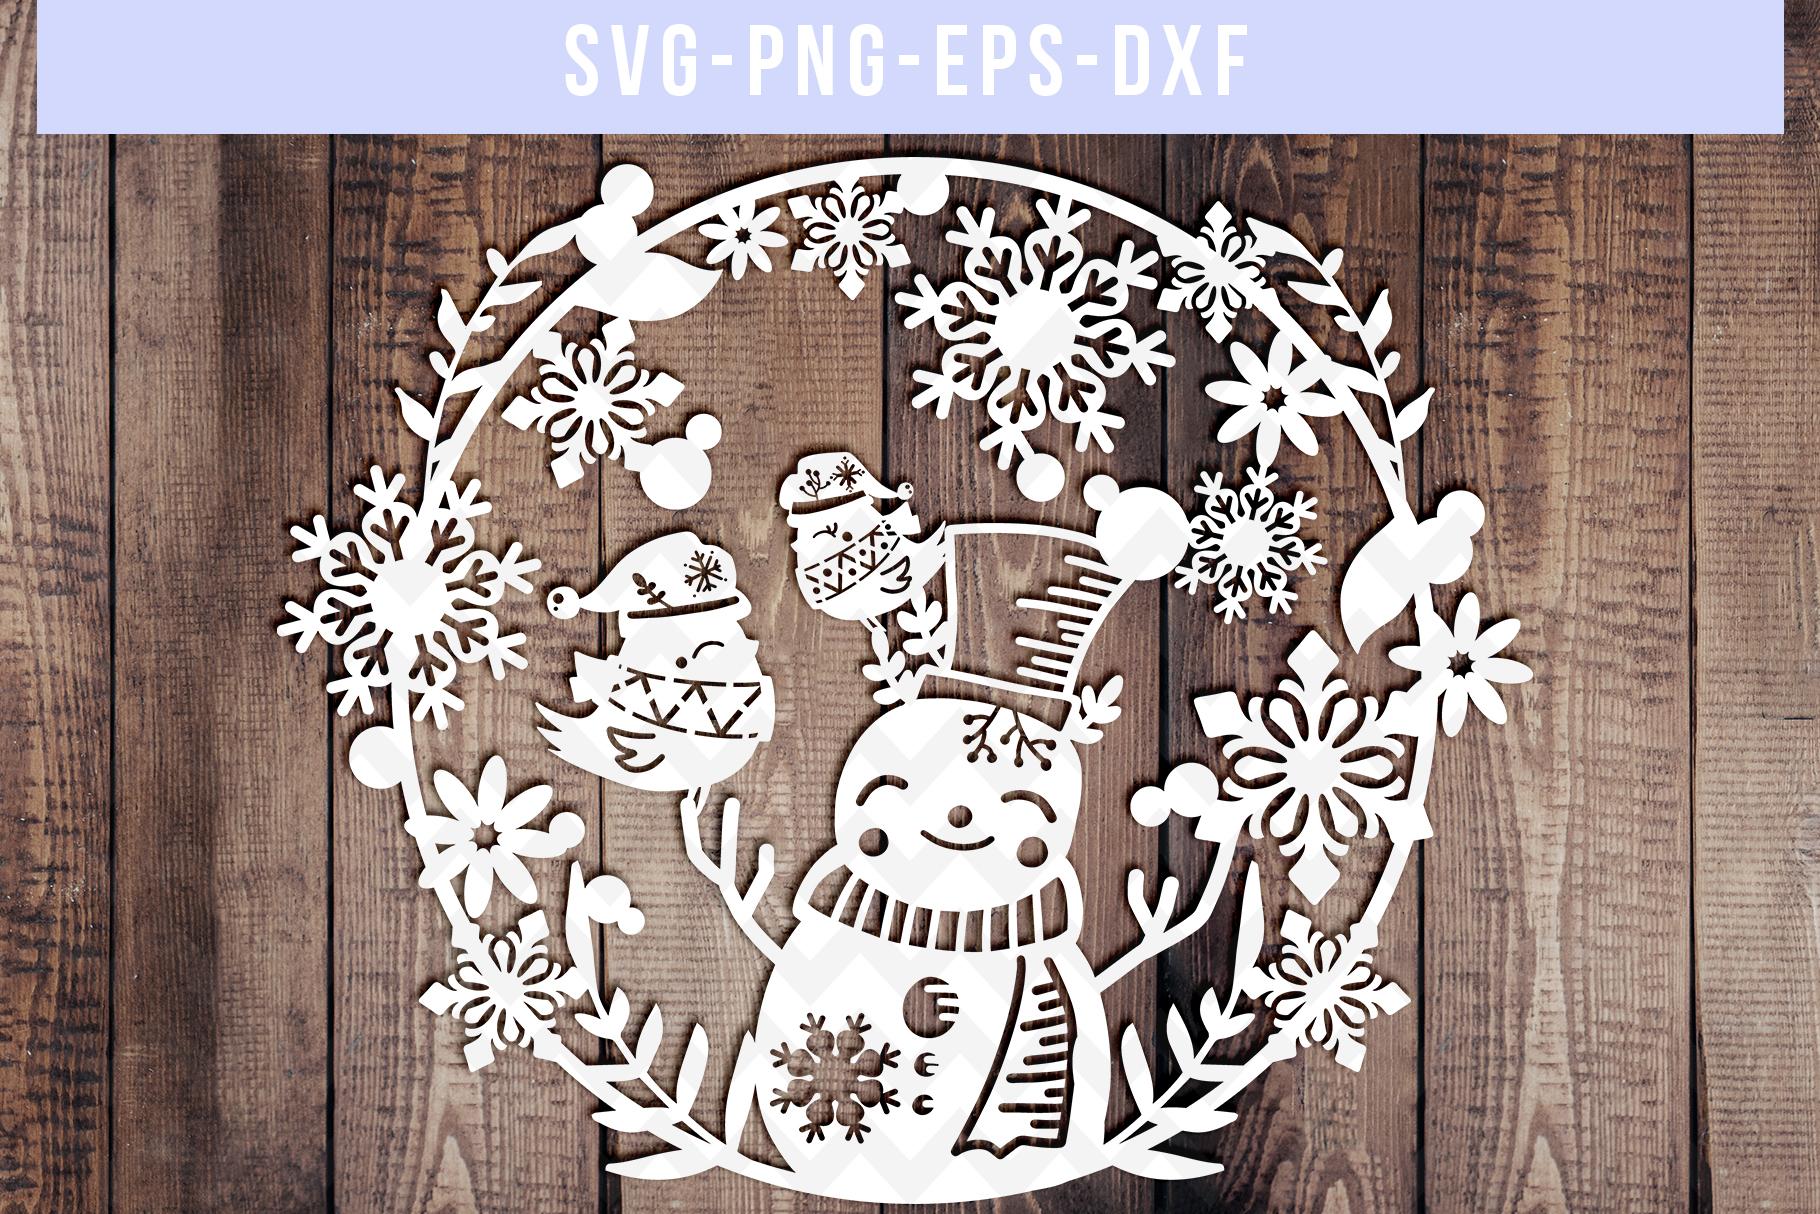 Winter SVG Cut File, Snowflake Papercut, Snowman Laser Cut example image 1